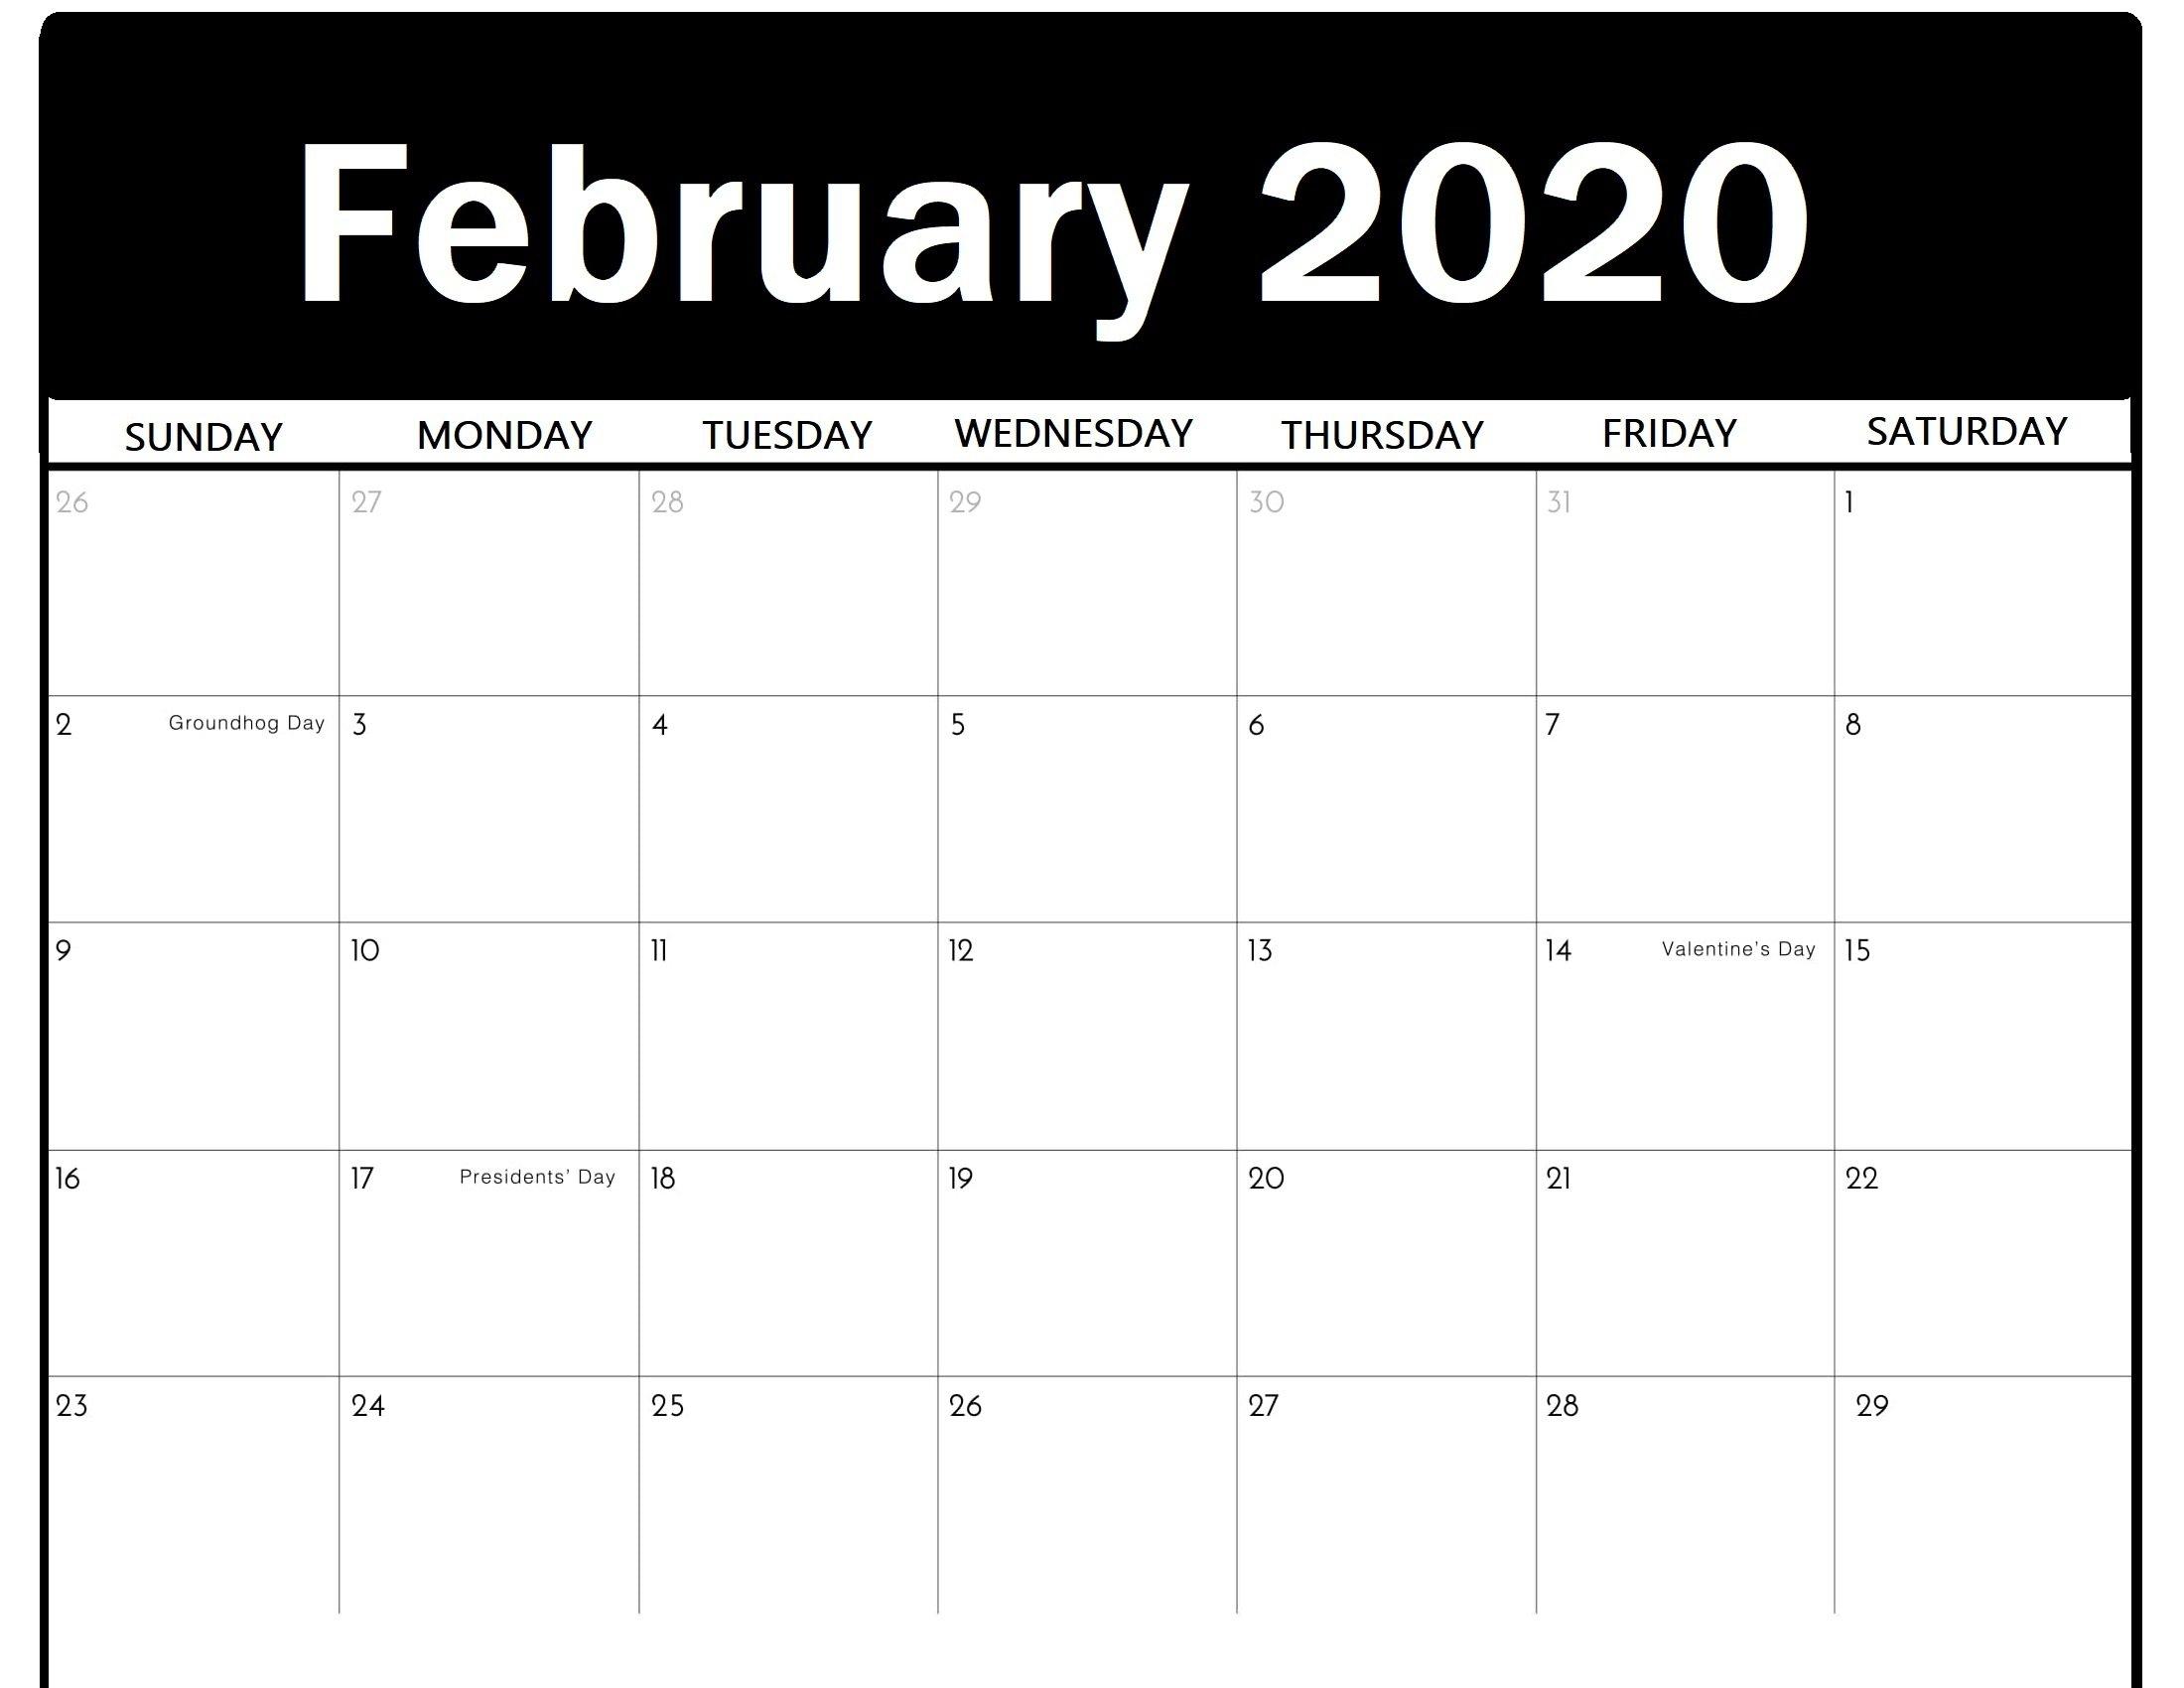 Printable February 2020 Calendar - Calendar-Kart Free 2020 Calendar With Days Counted 1-365